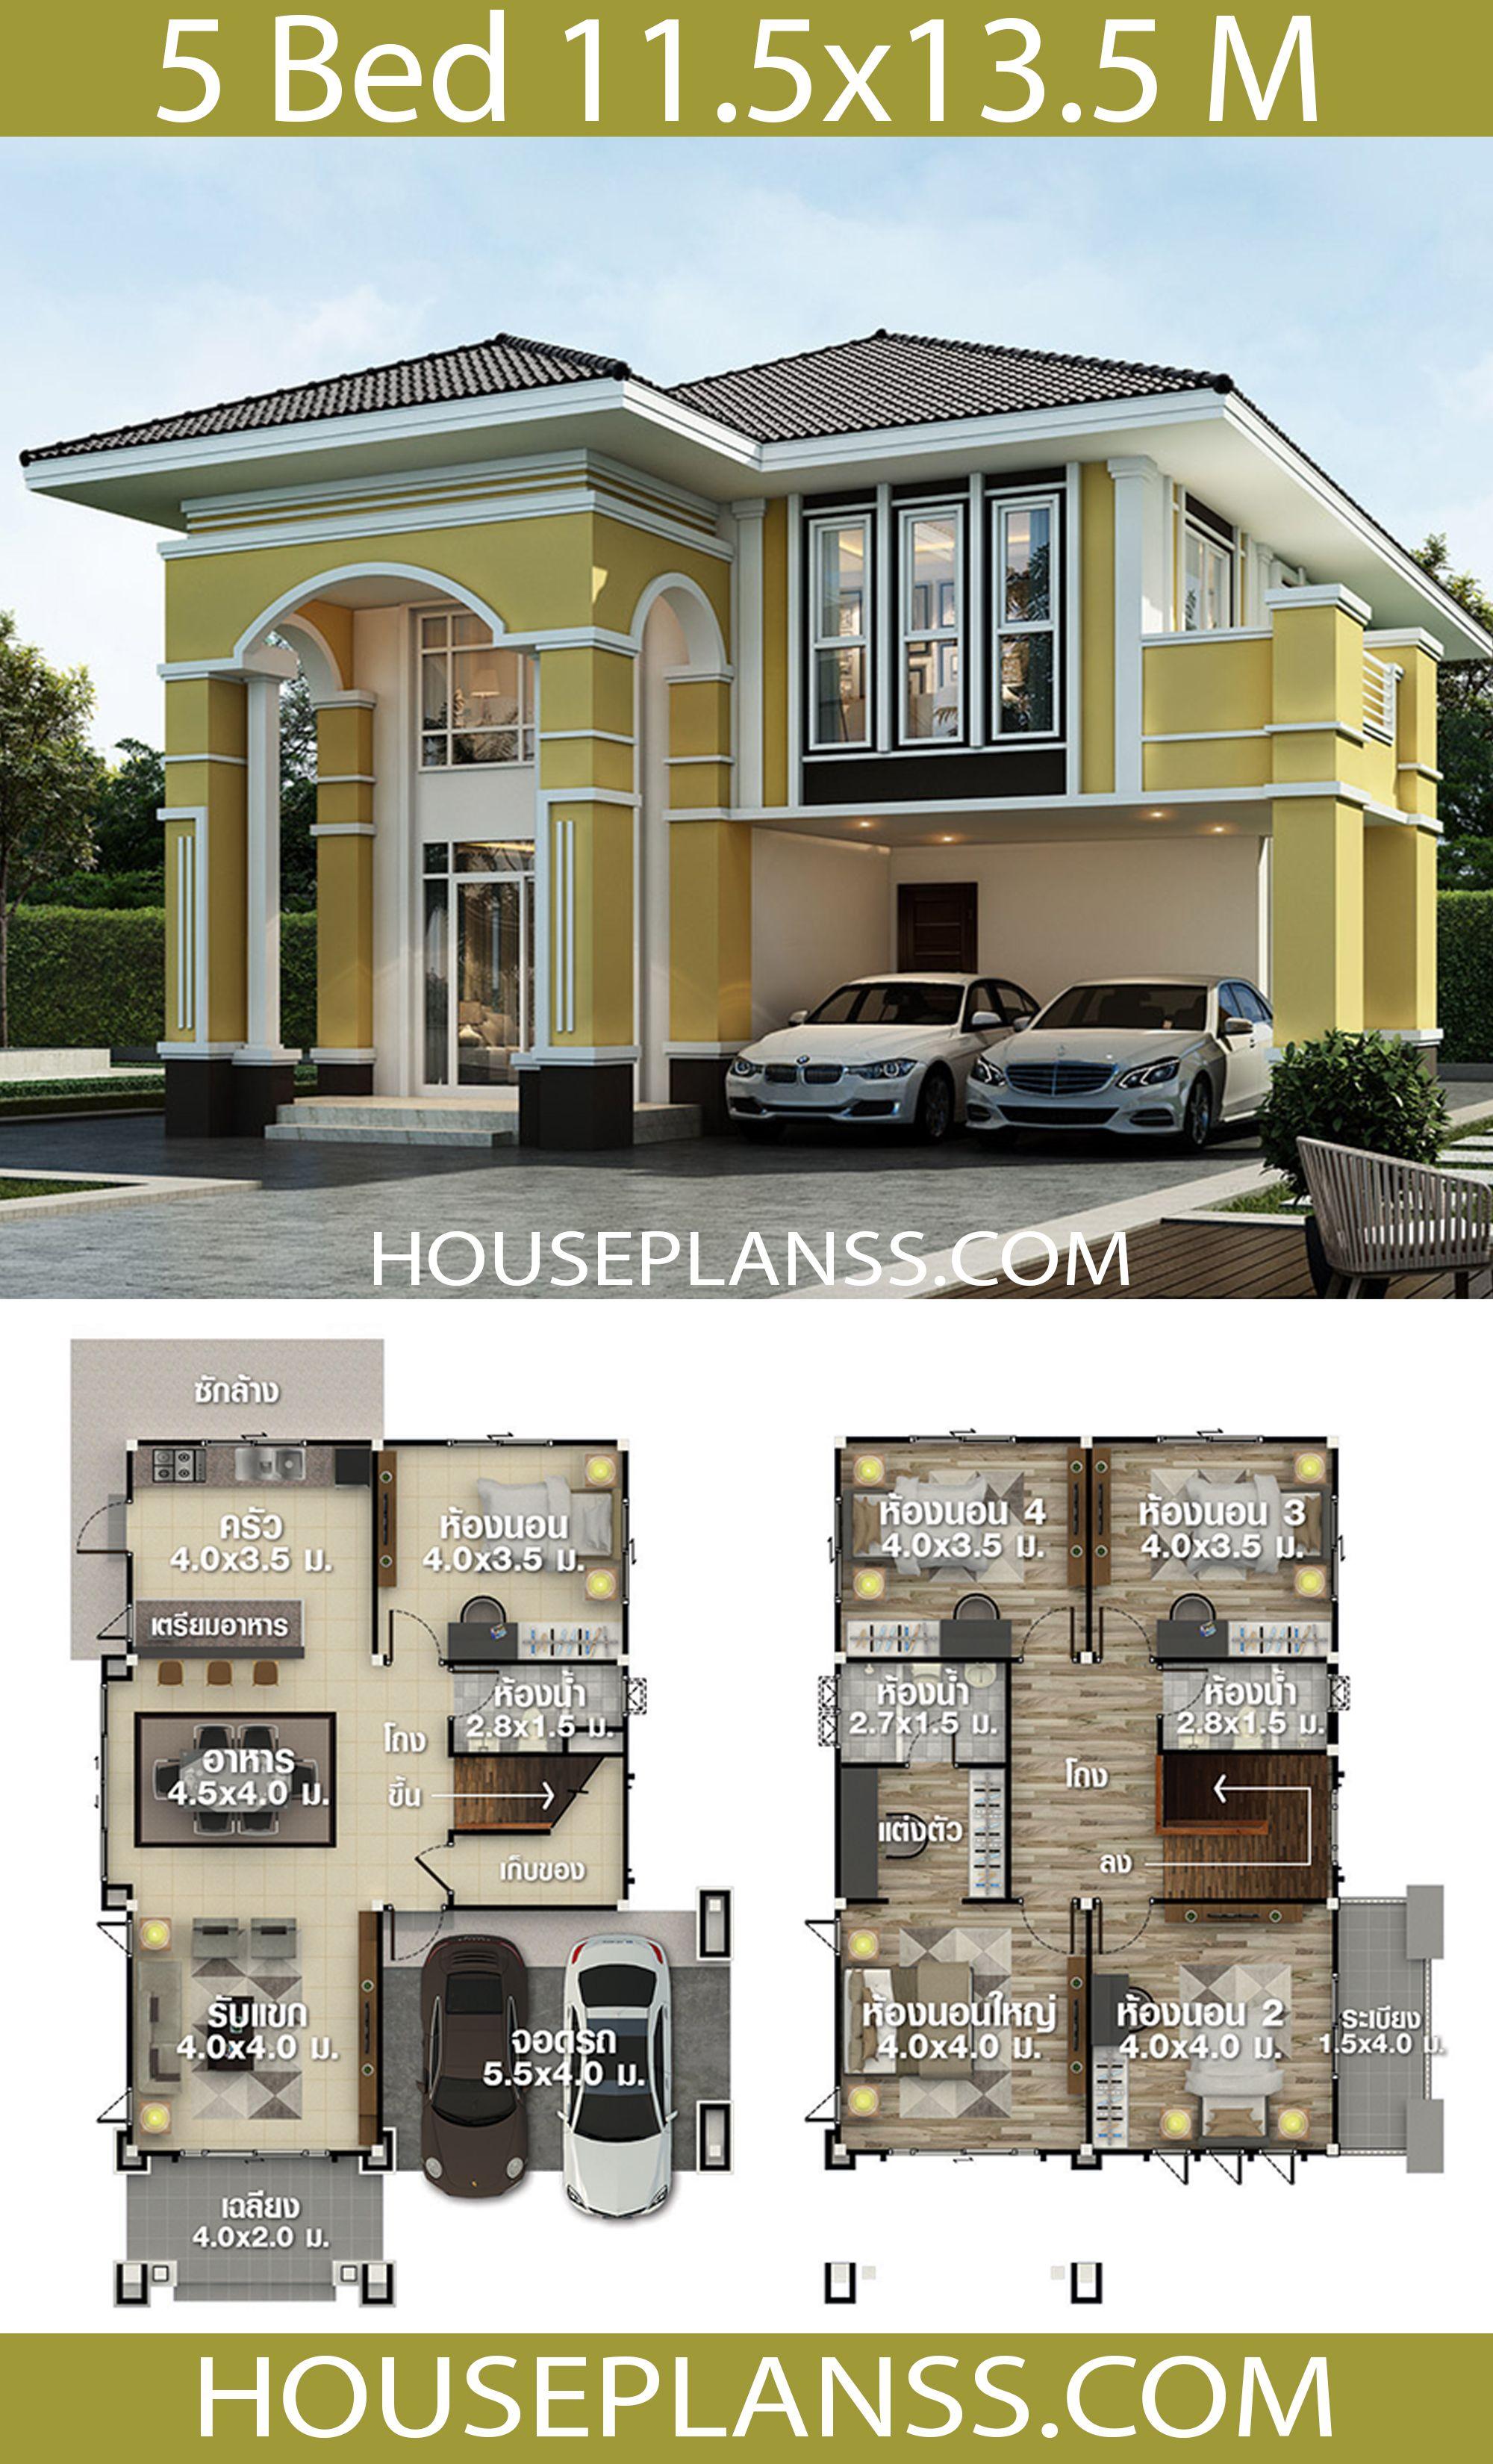 House Plans Idea 11 5x13 5 With 5 Bedrooms House Plans 3d In 2020 House Construction Plan Duplex House Design Model House Plan